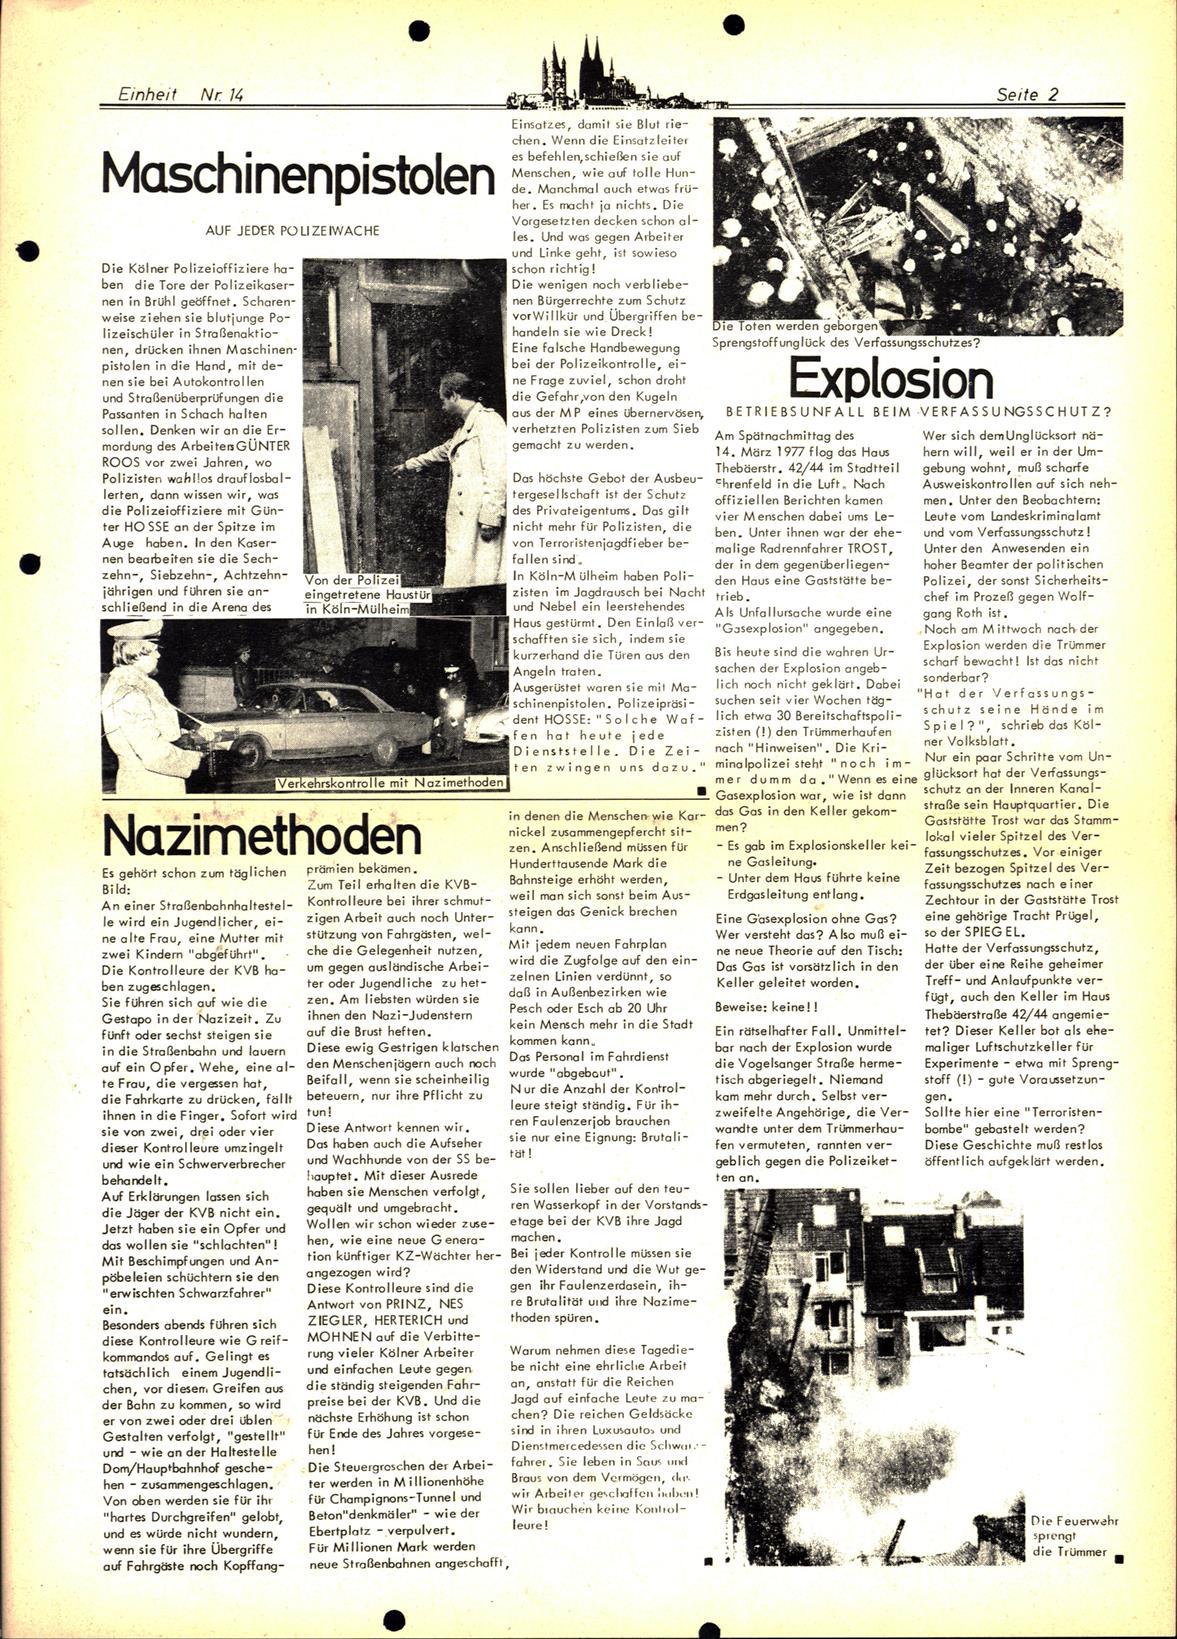 Koeln_IPdA_Einheit_1977_014_Stadt_002